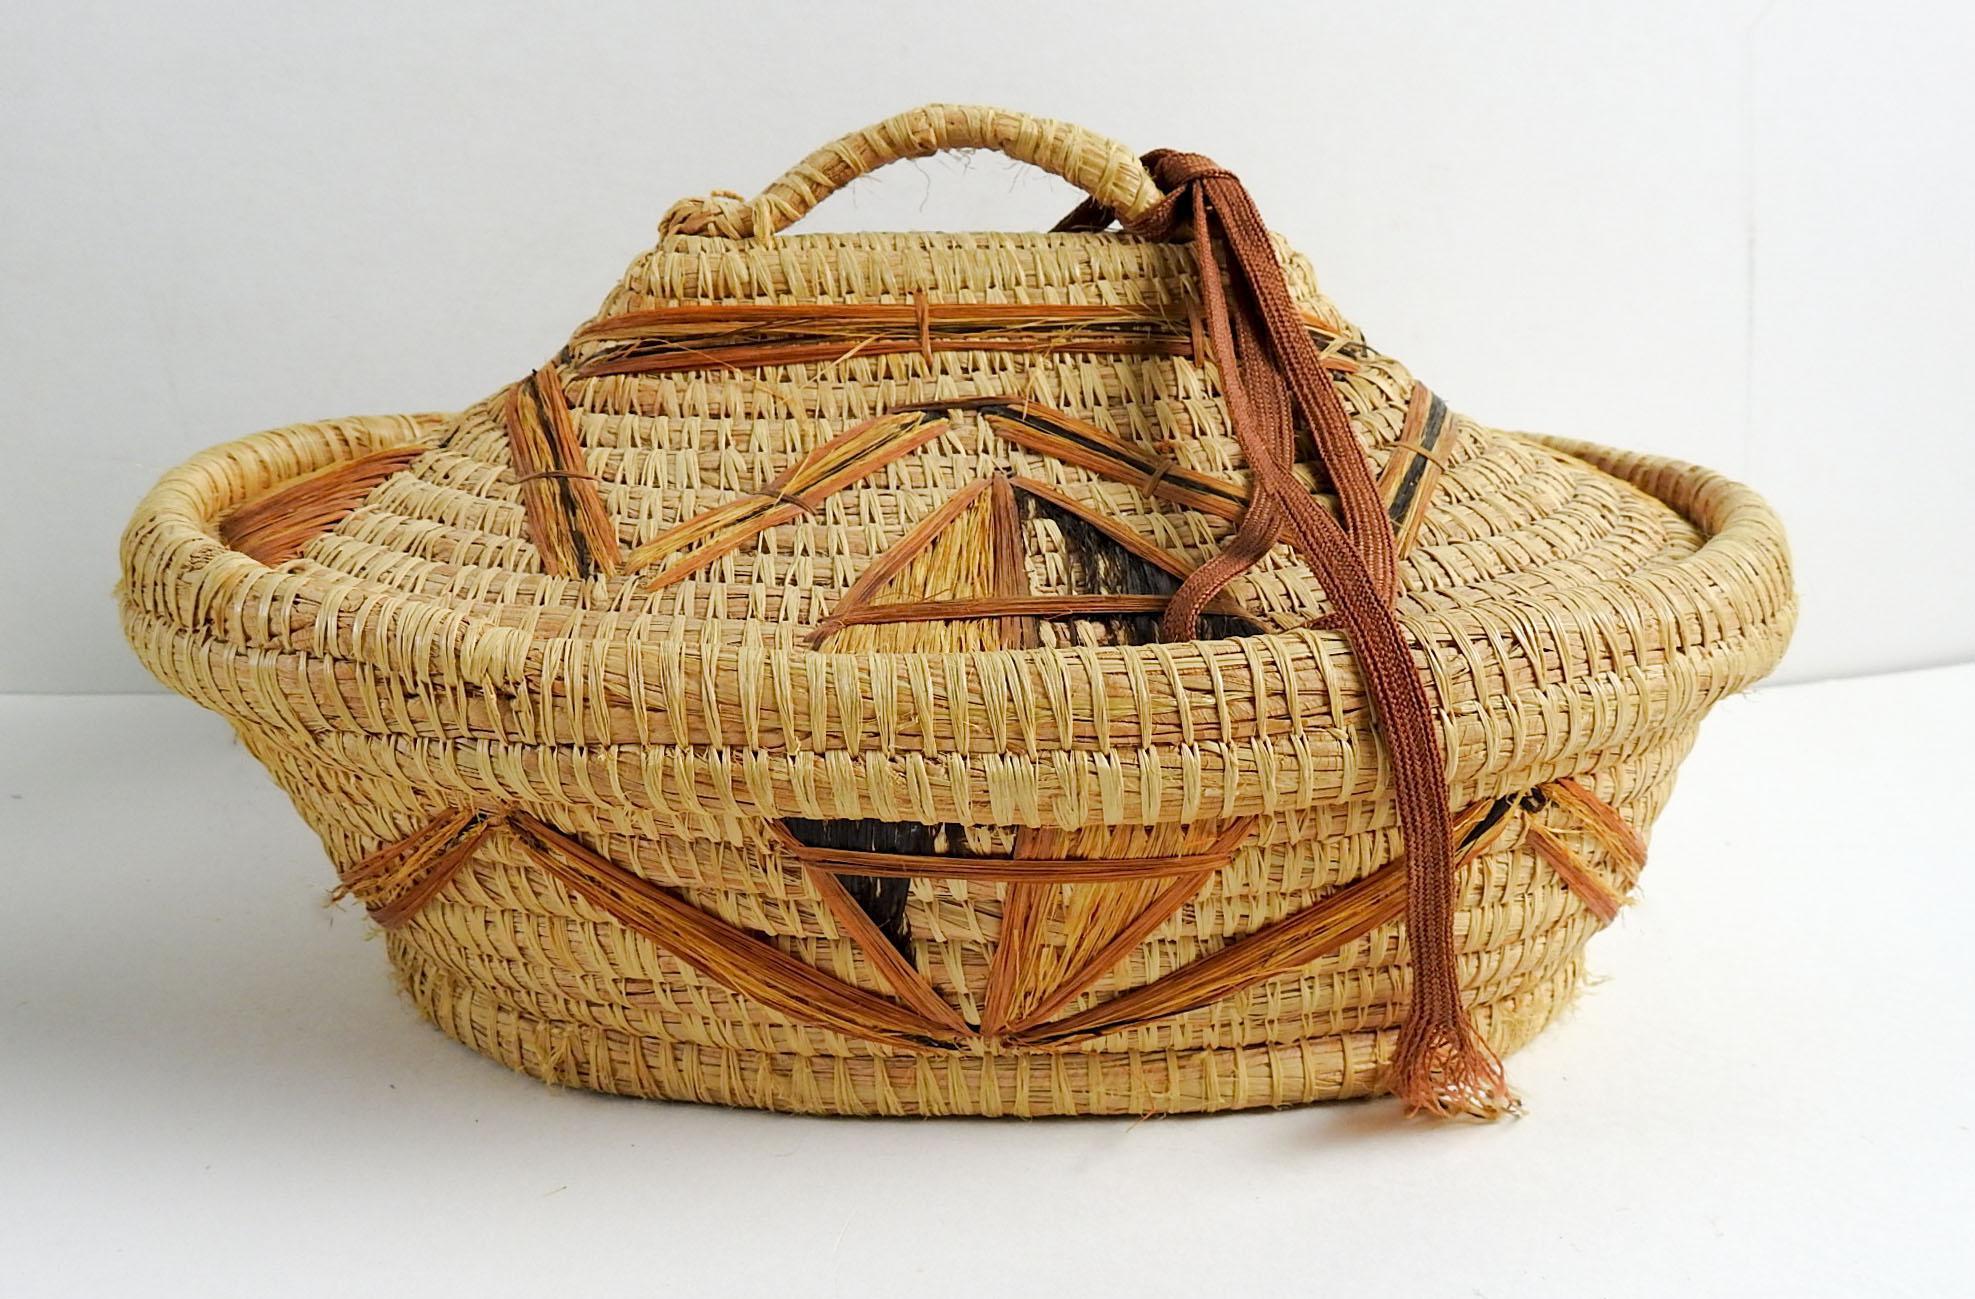 Coil Grass U0026 Raffia Woven Lidded Basket   Image 2 Of 10